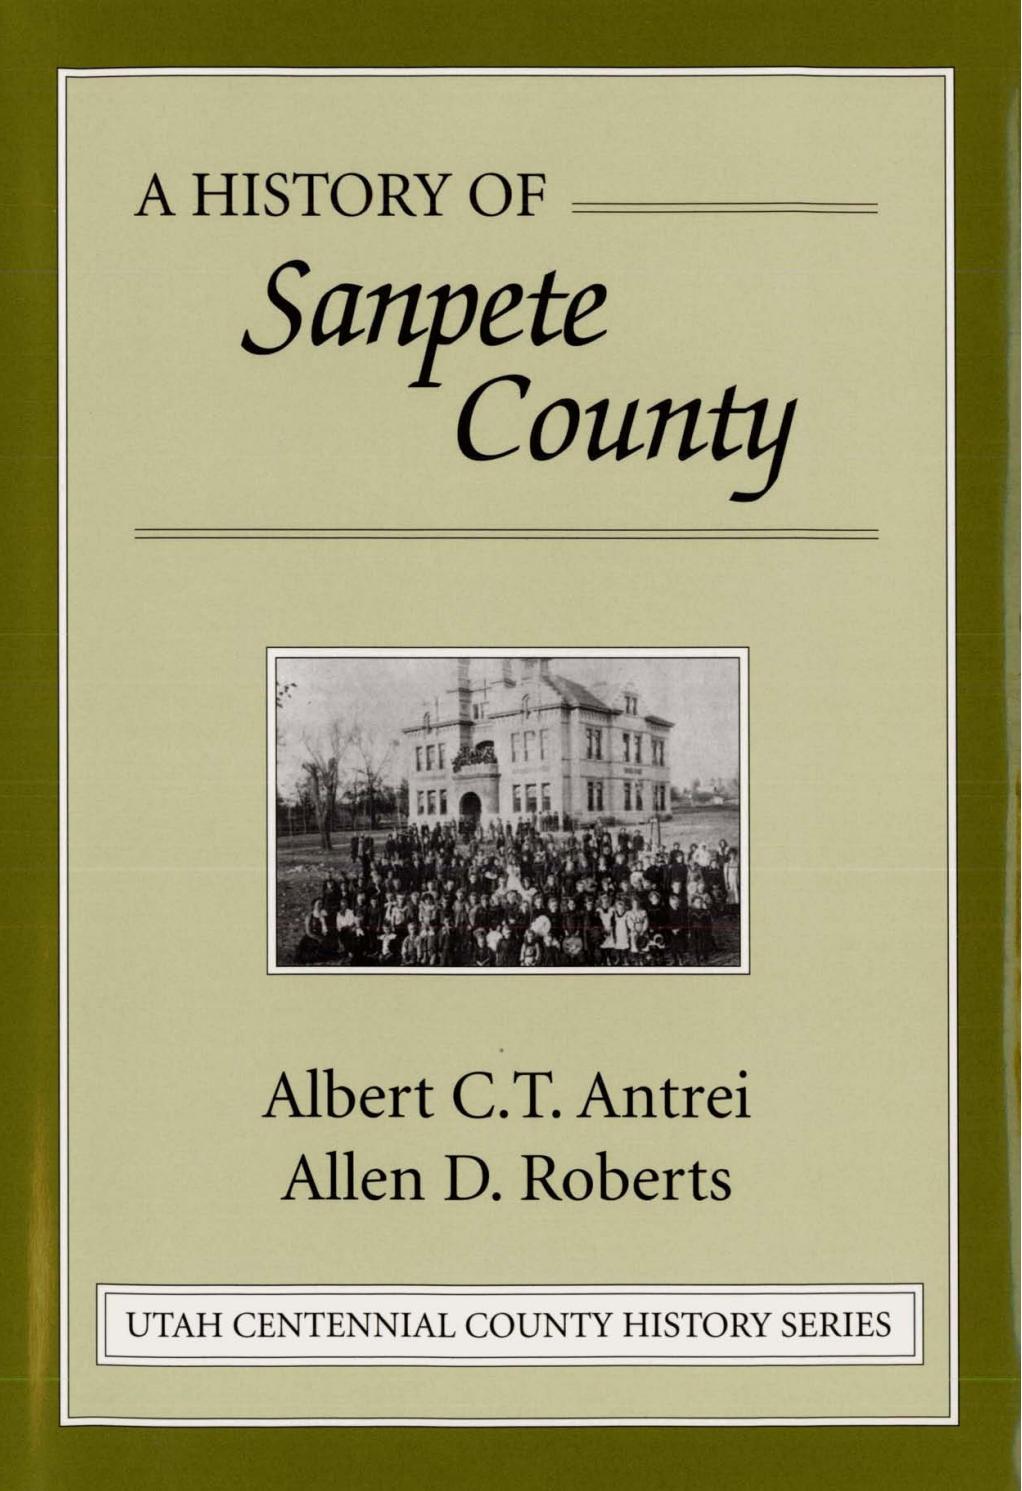 Utah Centennial County History Series - Sanpete County 1999